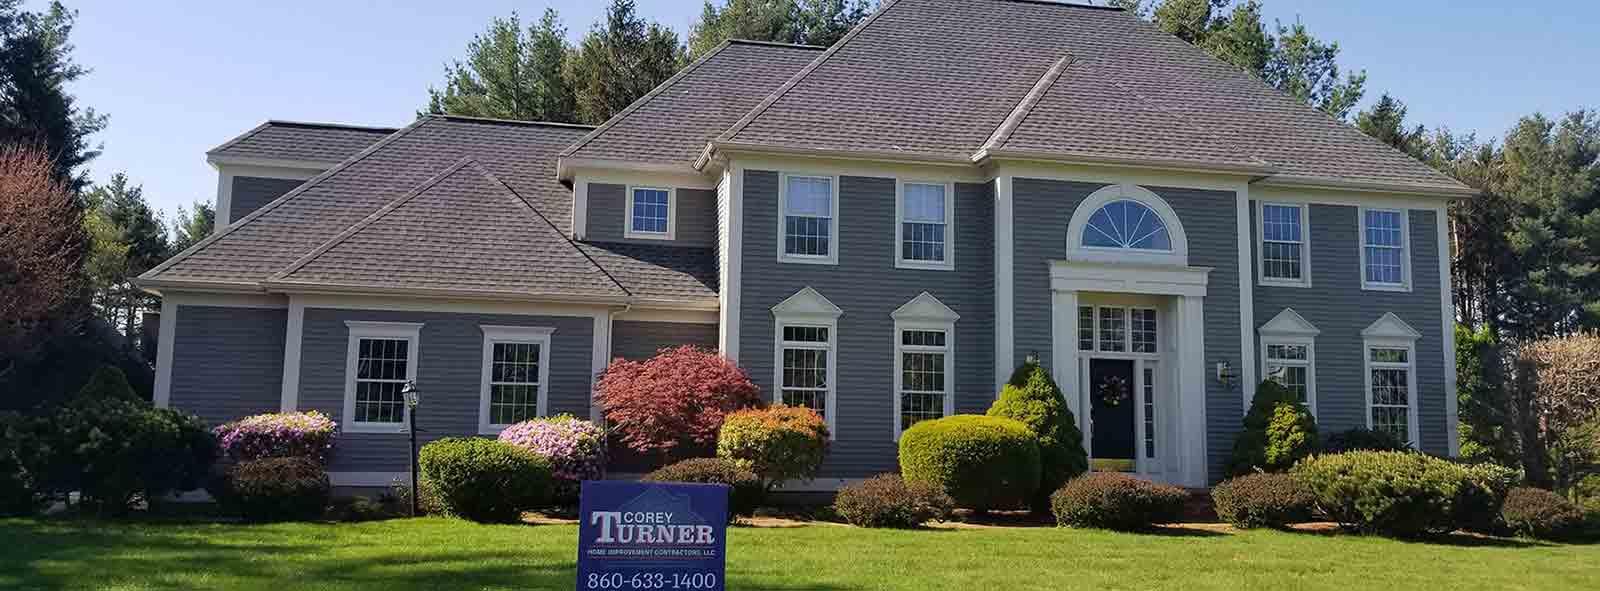 Turner Home Improvement Contractors Llc Glastonbury Ct